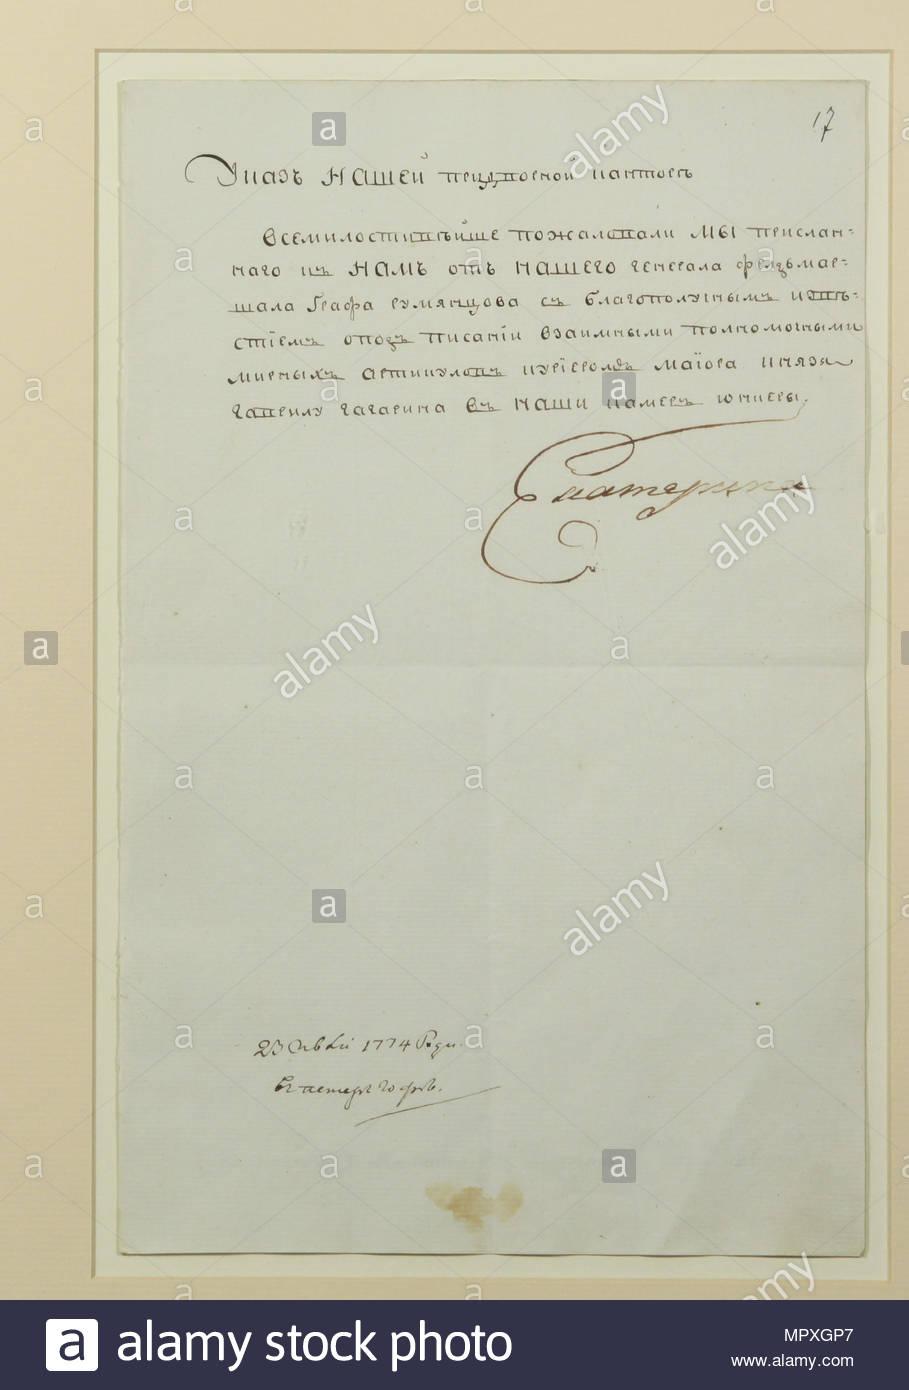 The decree of Empress Catherine II, 1774. - Stock Image